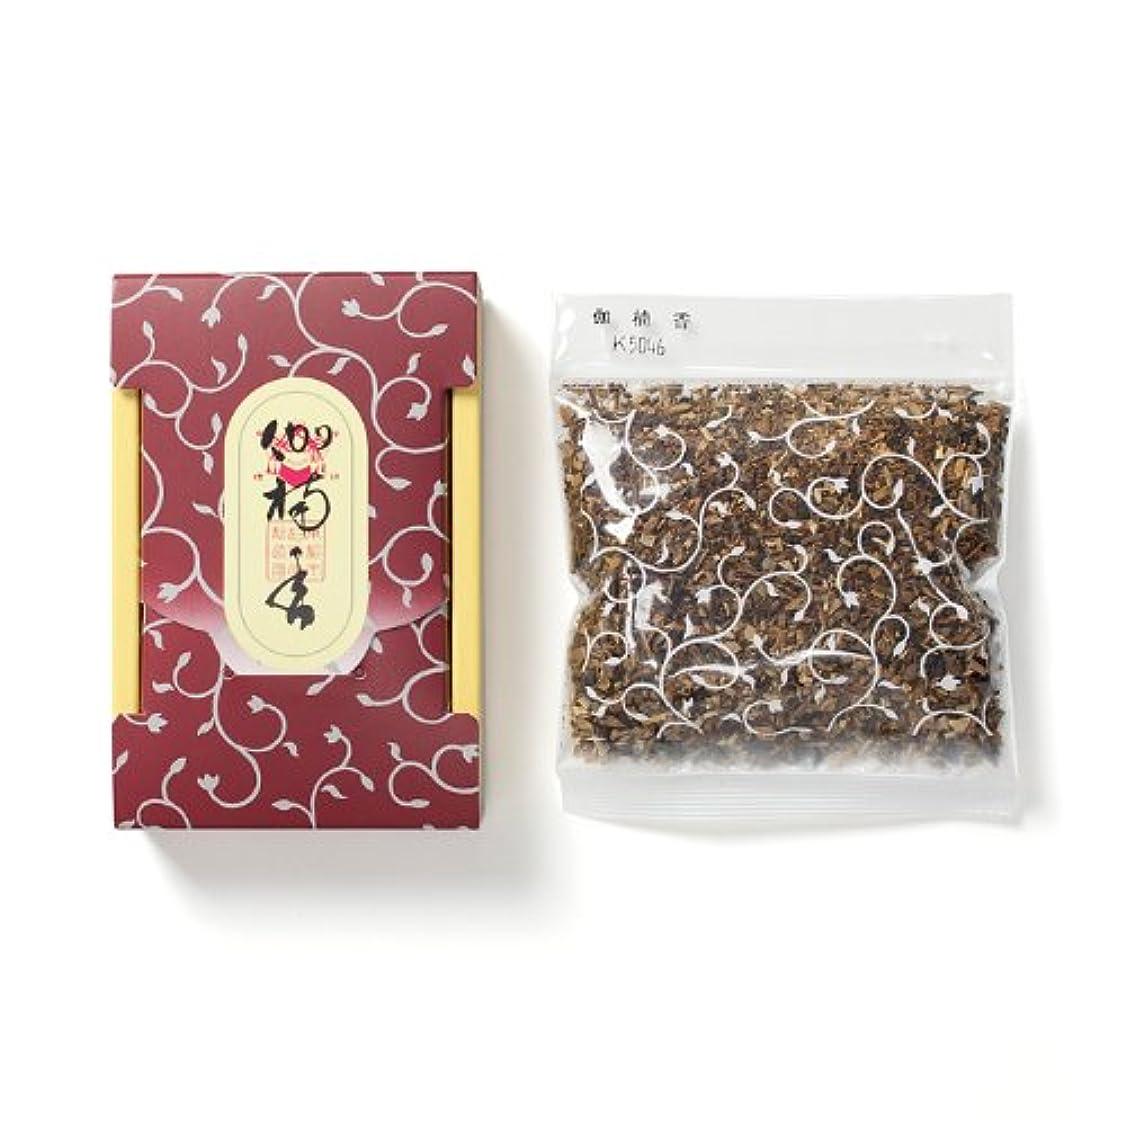 松栄堂のお焼香 伽楠香 25g詰 小箱入 #410641